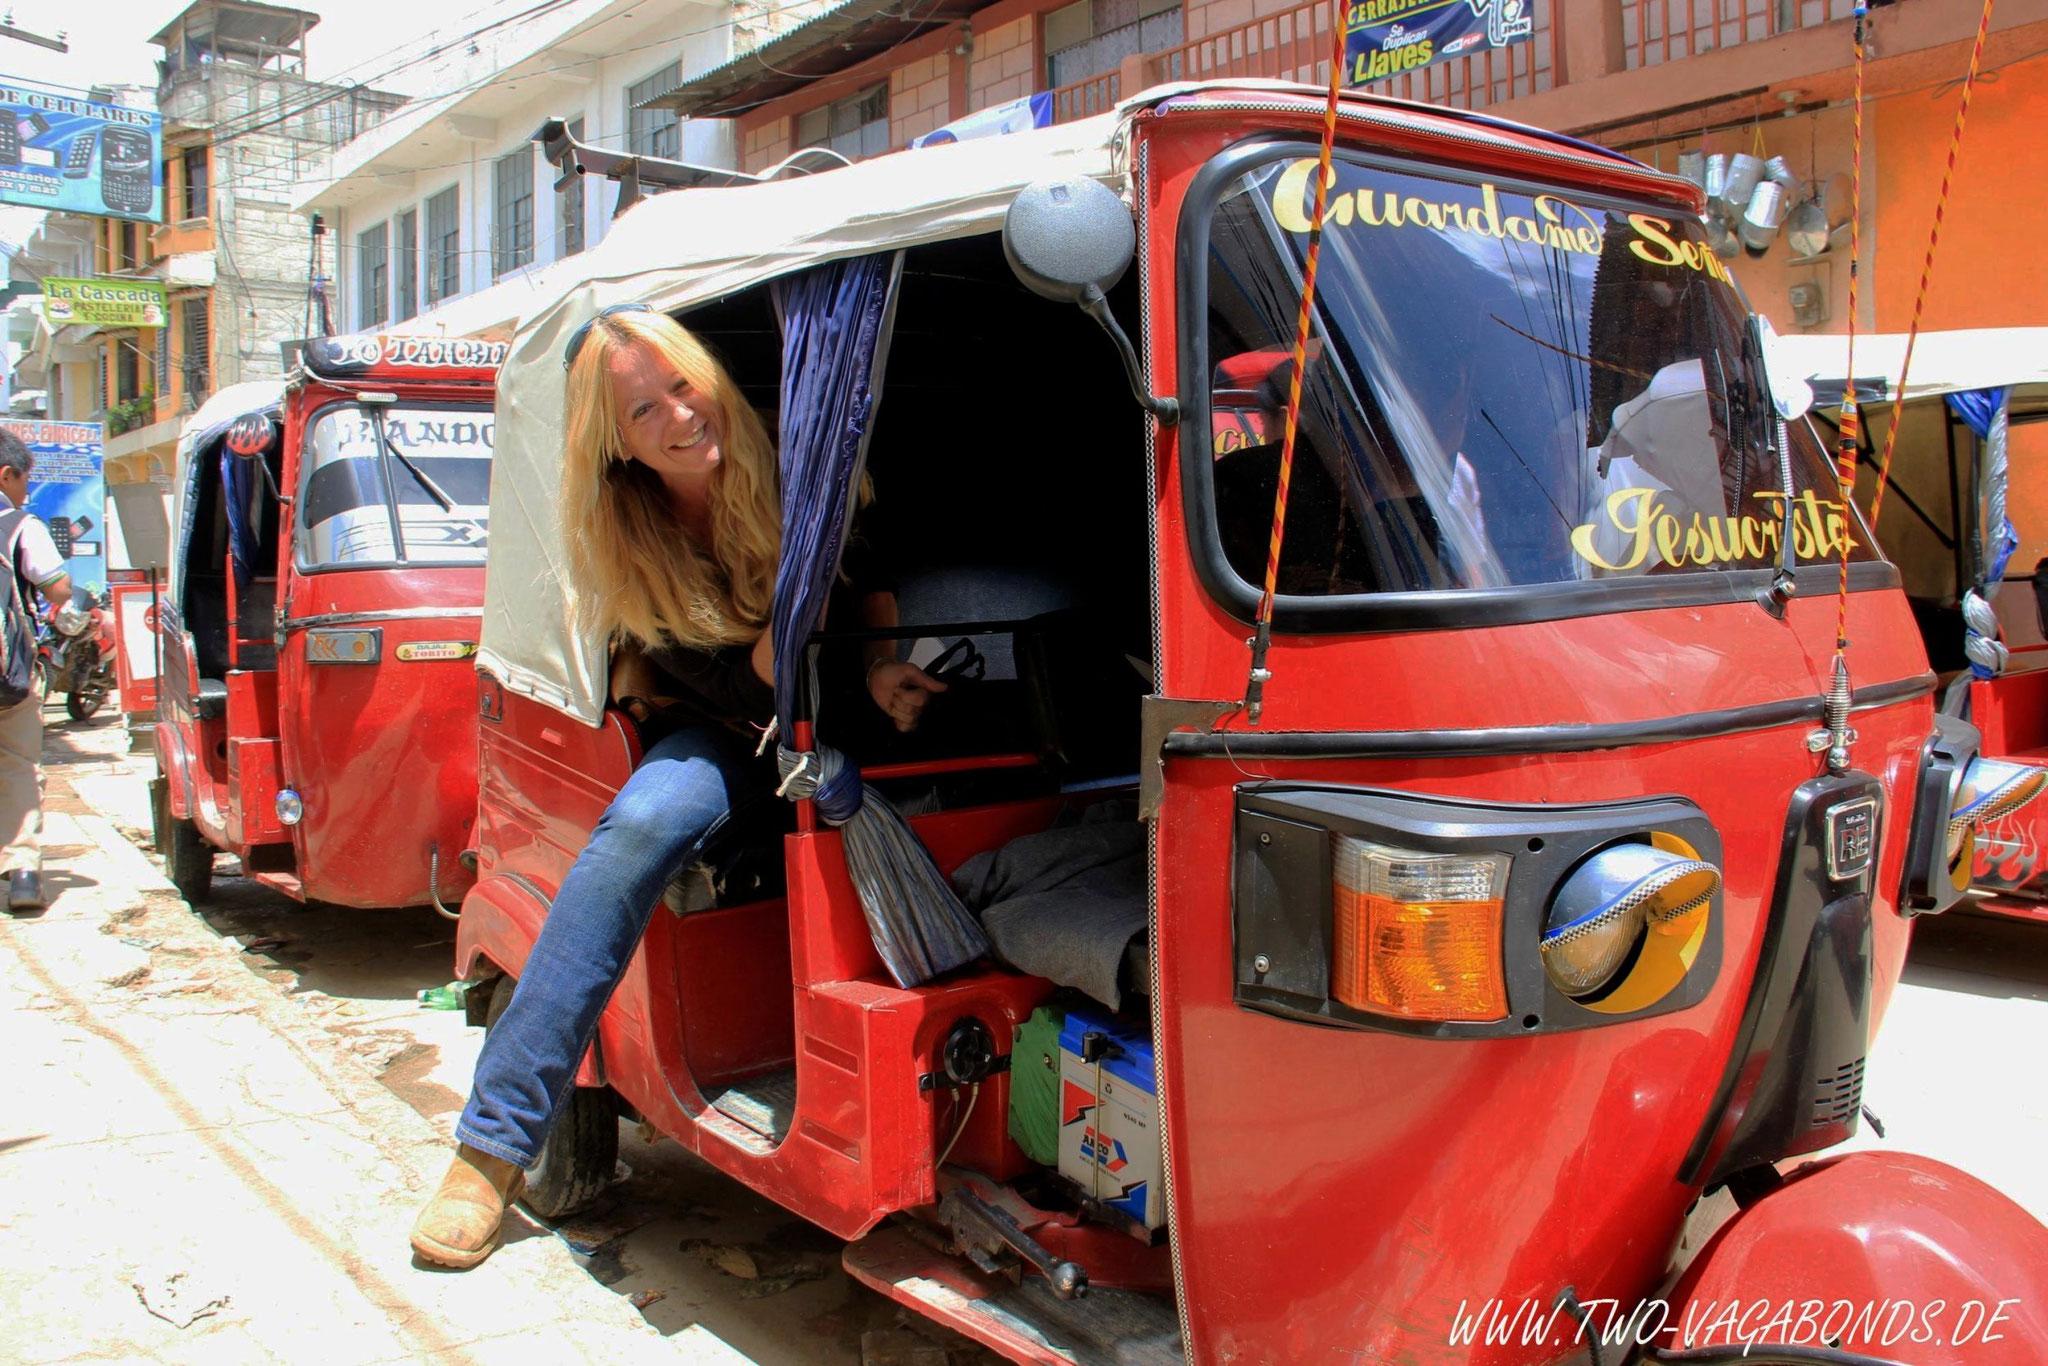 GUATEMALA 2012 - MOMOSTENANGO